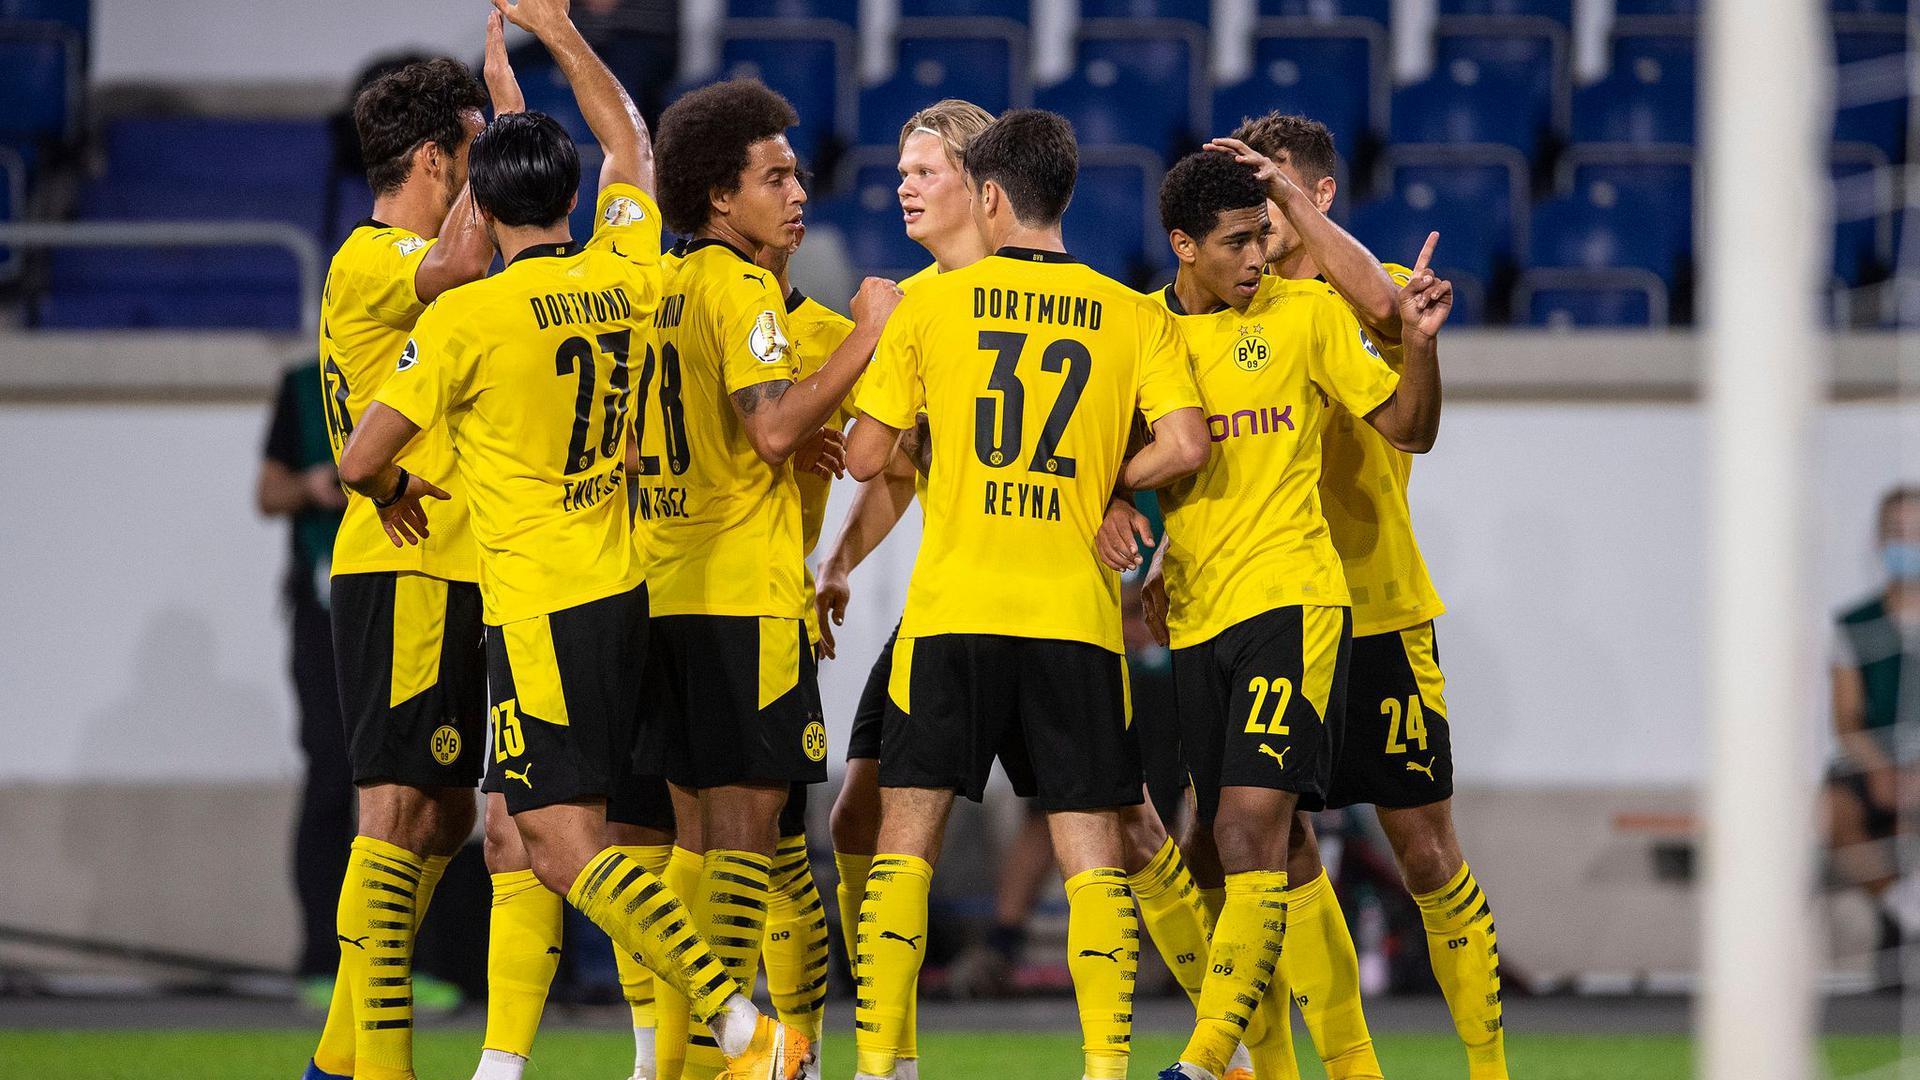 Die Dortmunder um Neuzugang Jude Bellingham (2.v.r.) haben ein junges Team.